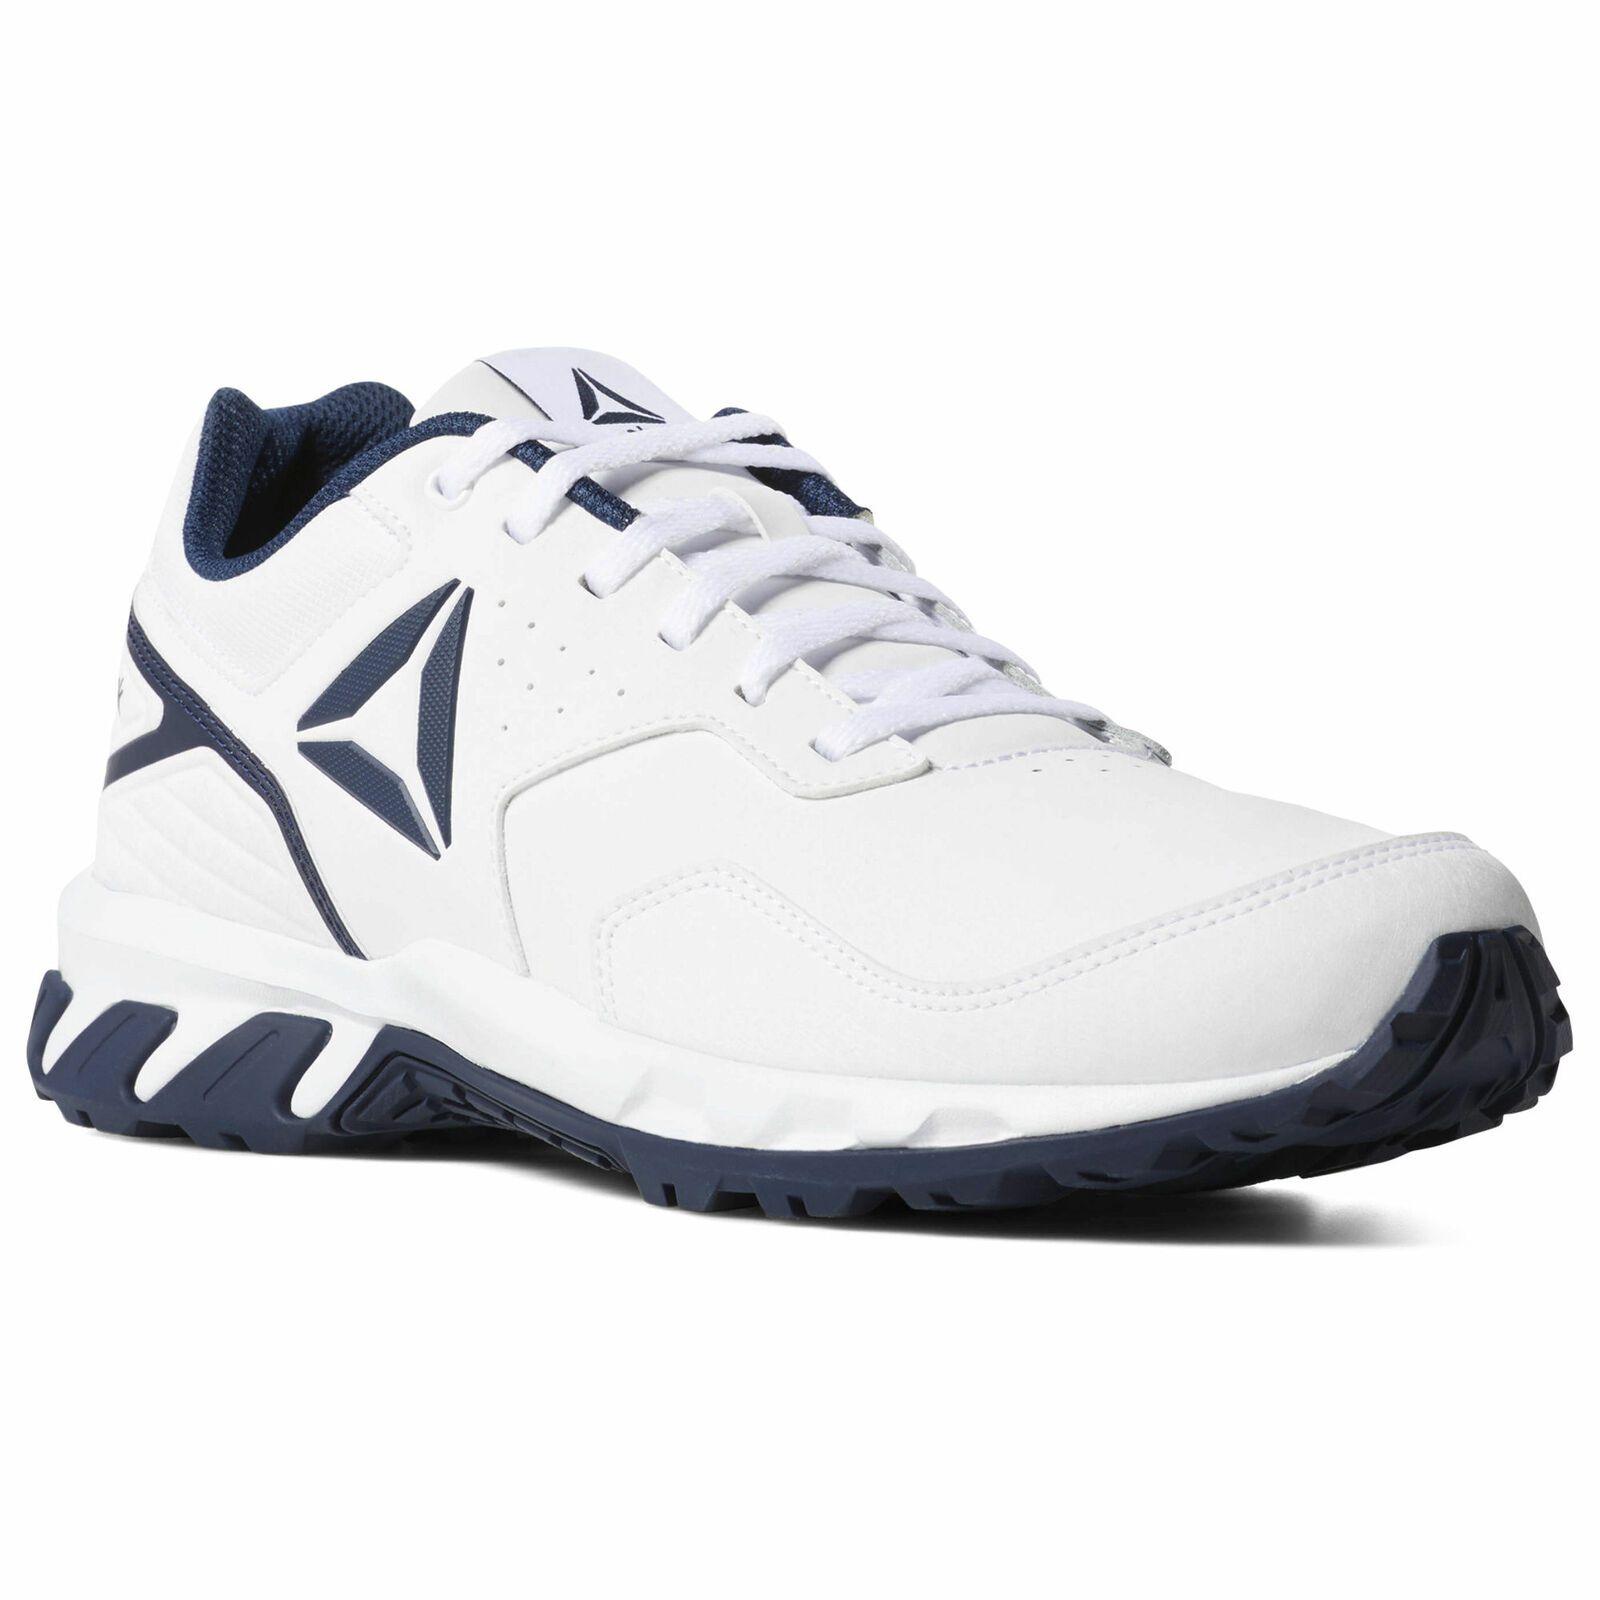 Ridgerider 4 Shoes | Mens walking shoes